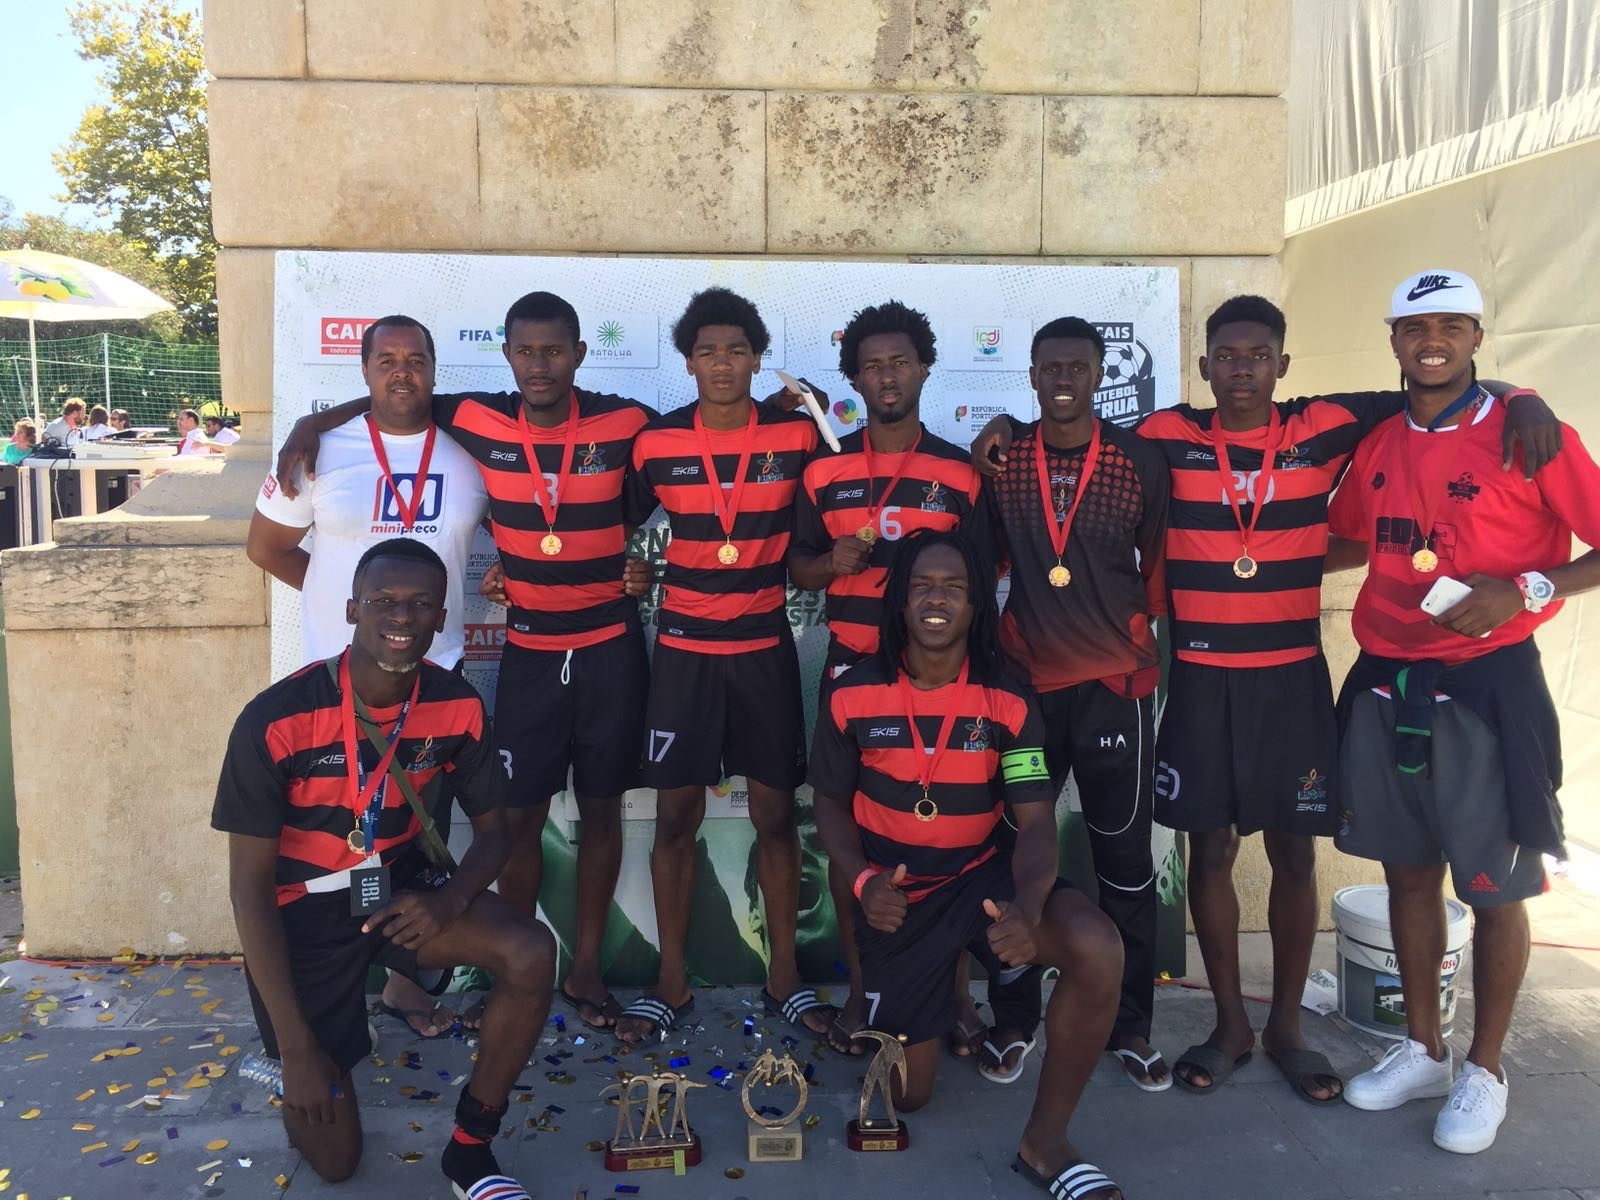 equipa Vencedora